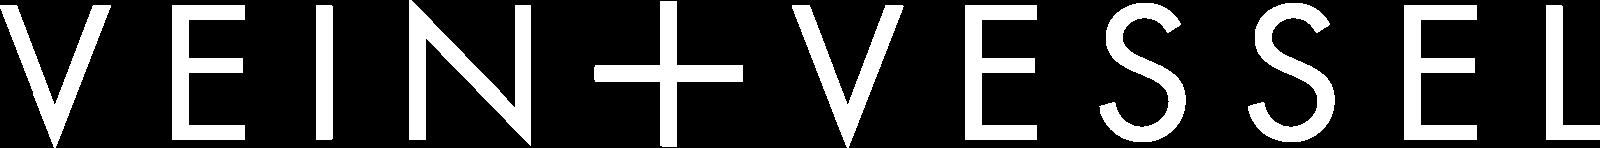 vv-logo-sans copy copy.png